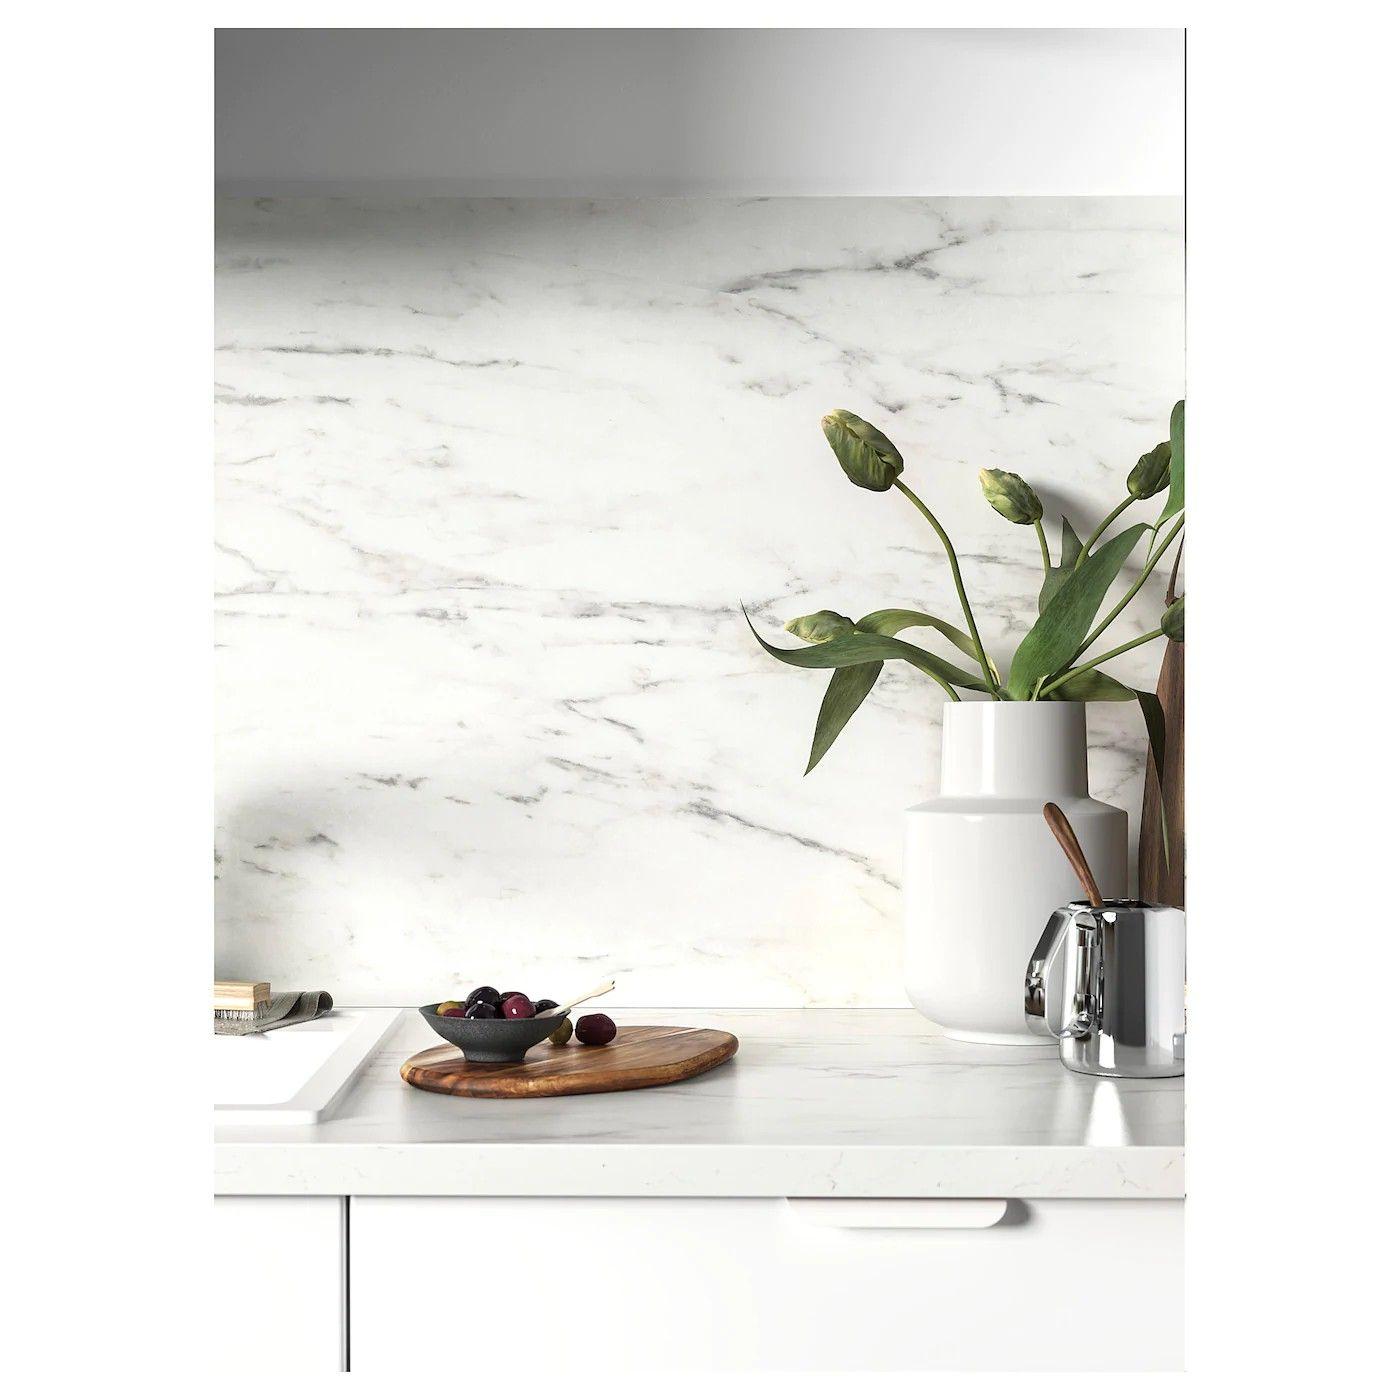 Ekbacken White Marble Effect Laminate Worktop 186x2 8 Cm Ikea In 2020 Laminaat Keuken Aanrecht Ikea